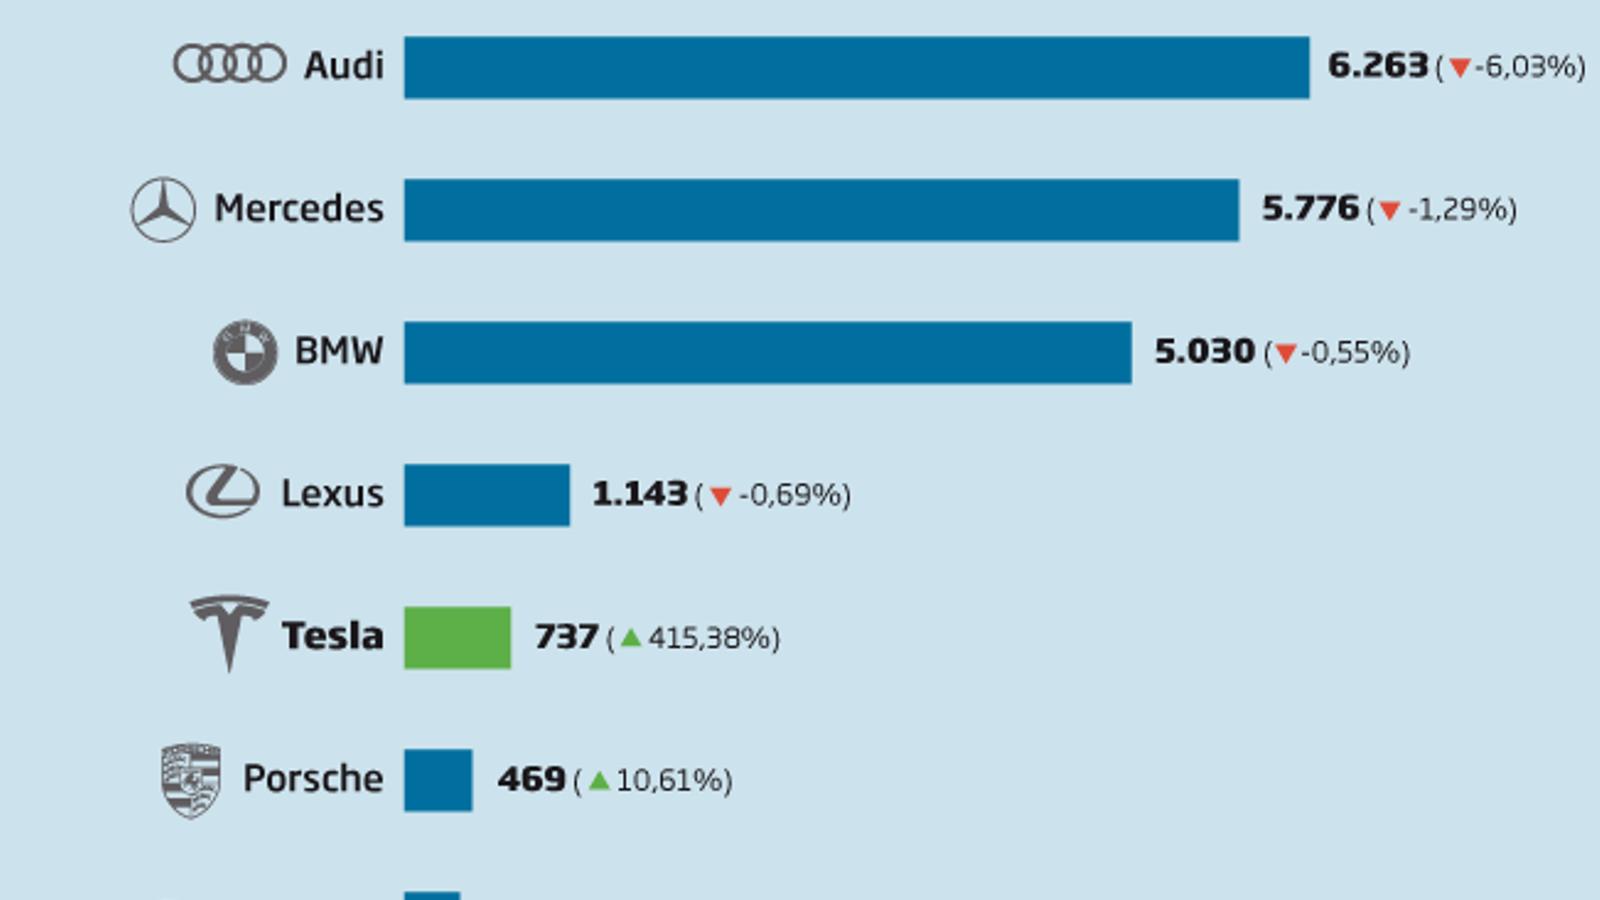 Infografia sobre les vendes de cotxes de luxe